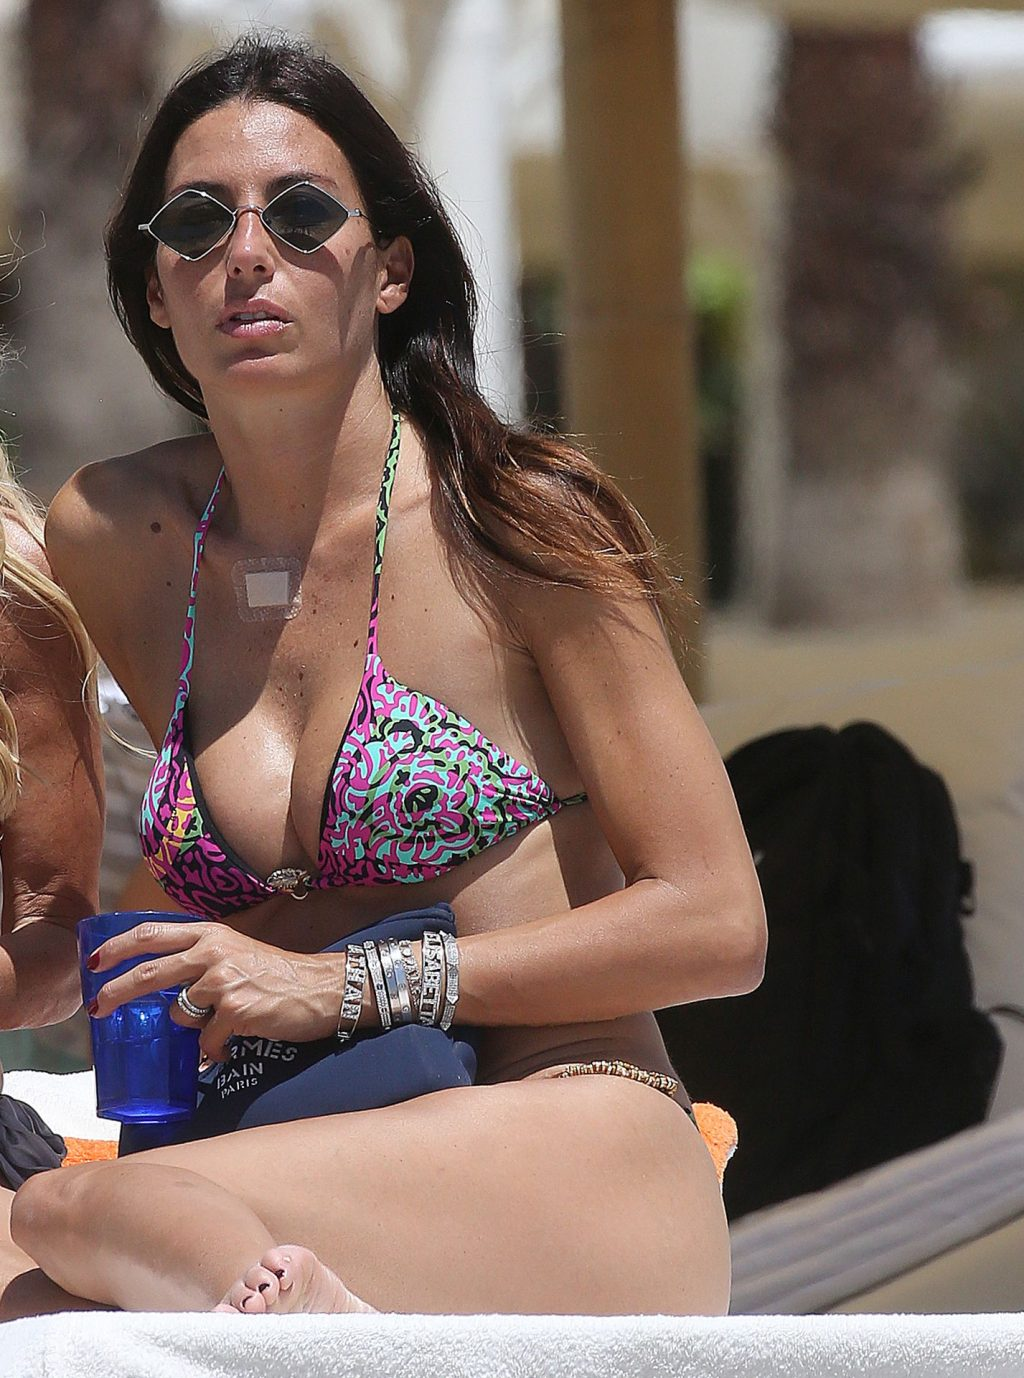 Elisabetta Gregoraci Shows Her Hot Body In Forte Dei Marmi (16 Photos)